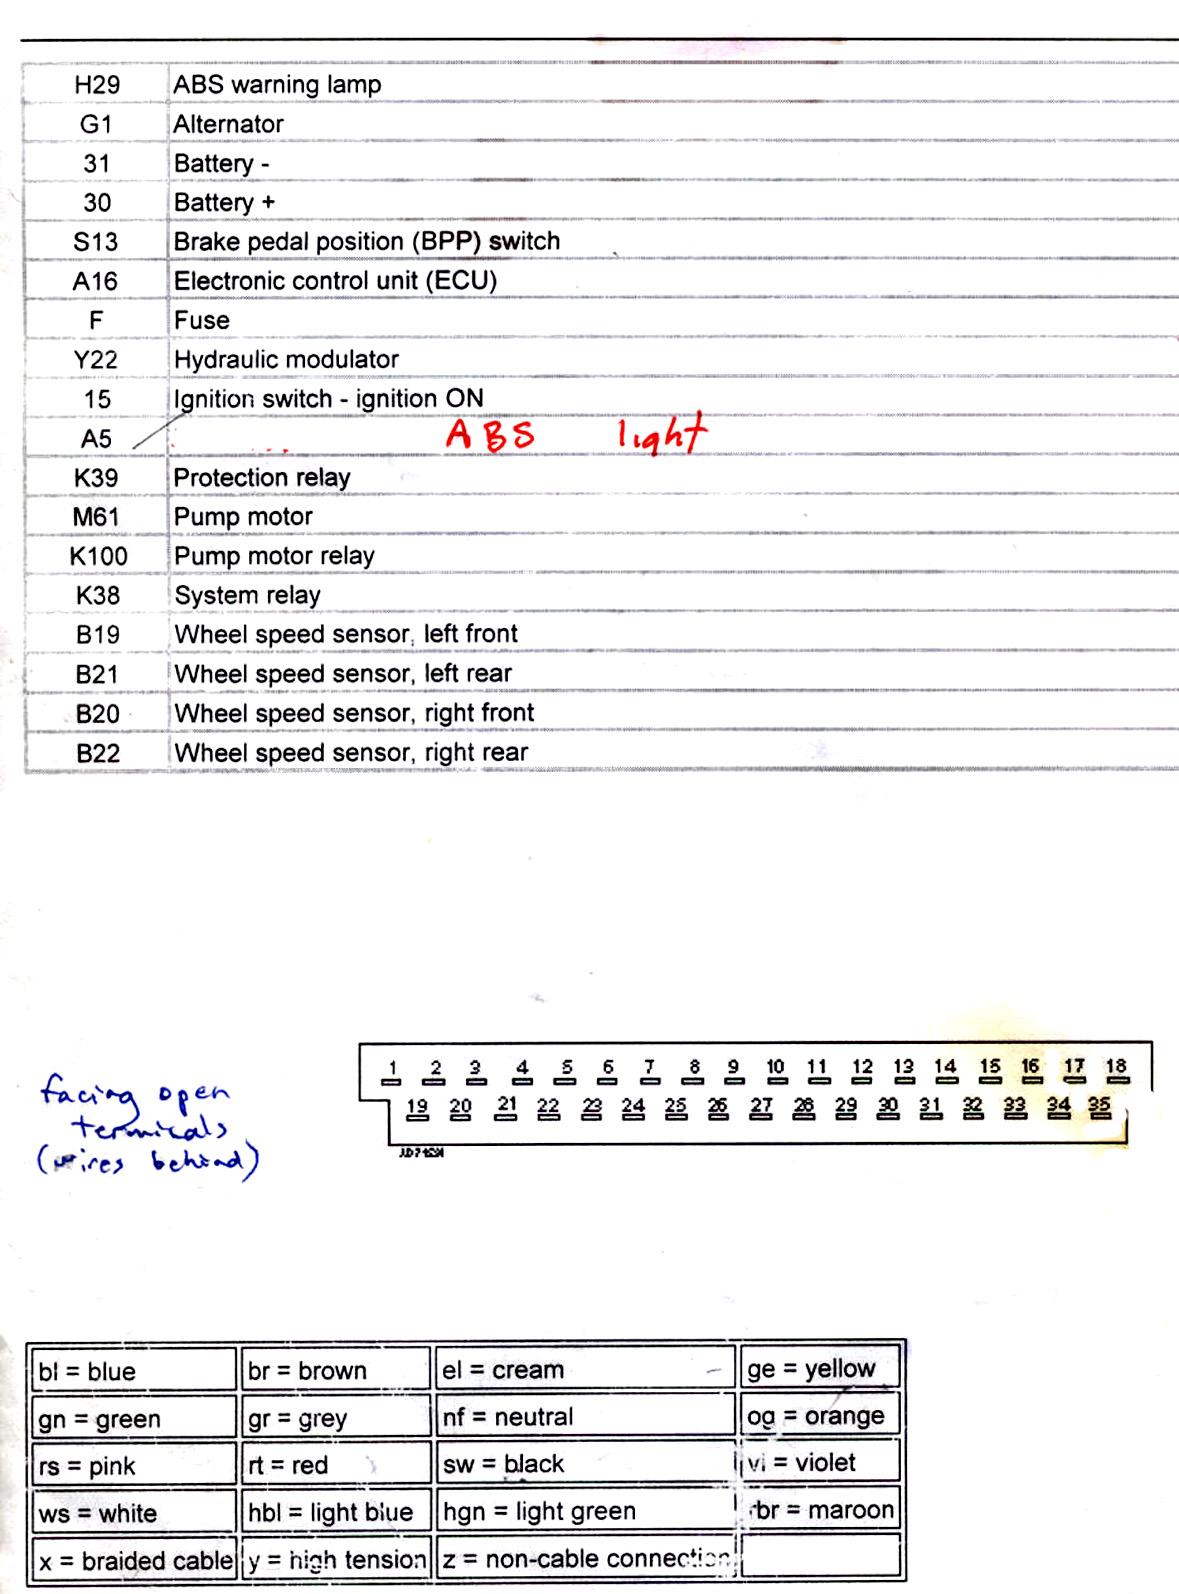 jun ming liu antilock braking system bench test locate the wiring diagram for your demonstrator vehicle the abs wheel speed sensor pin out connections to the ecu on the wiring diagram and the